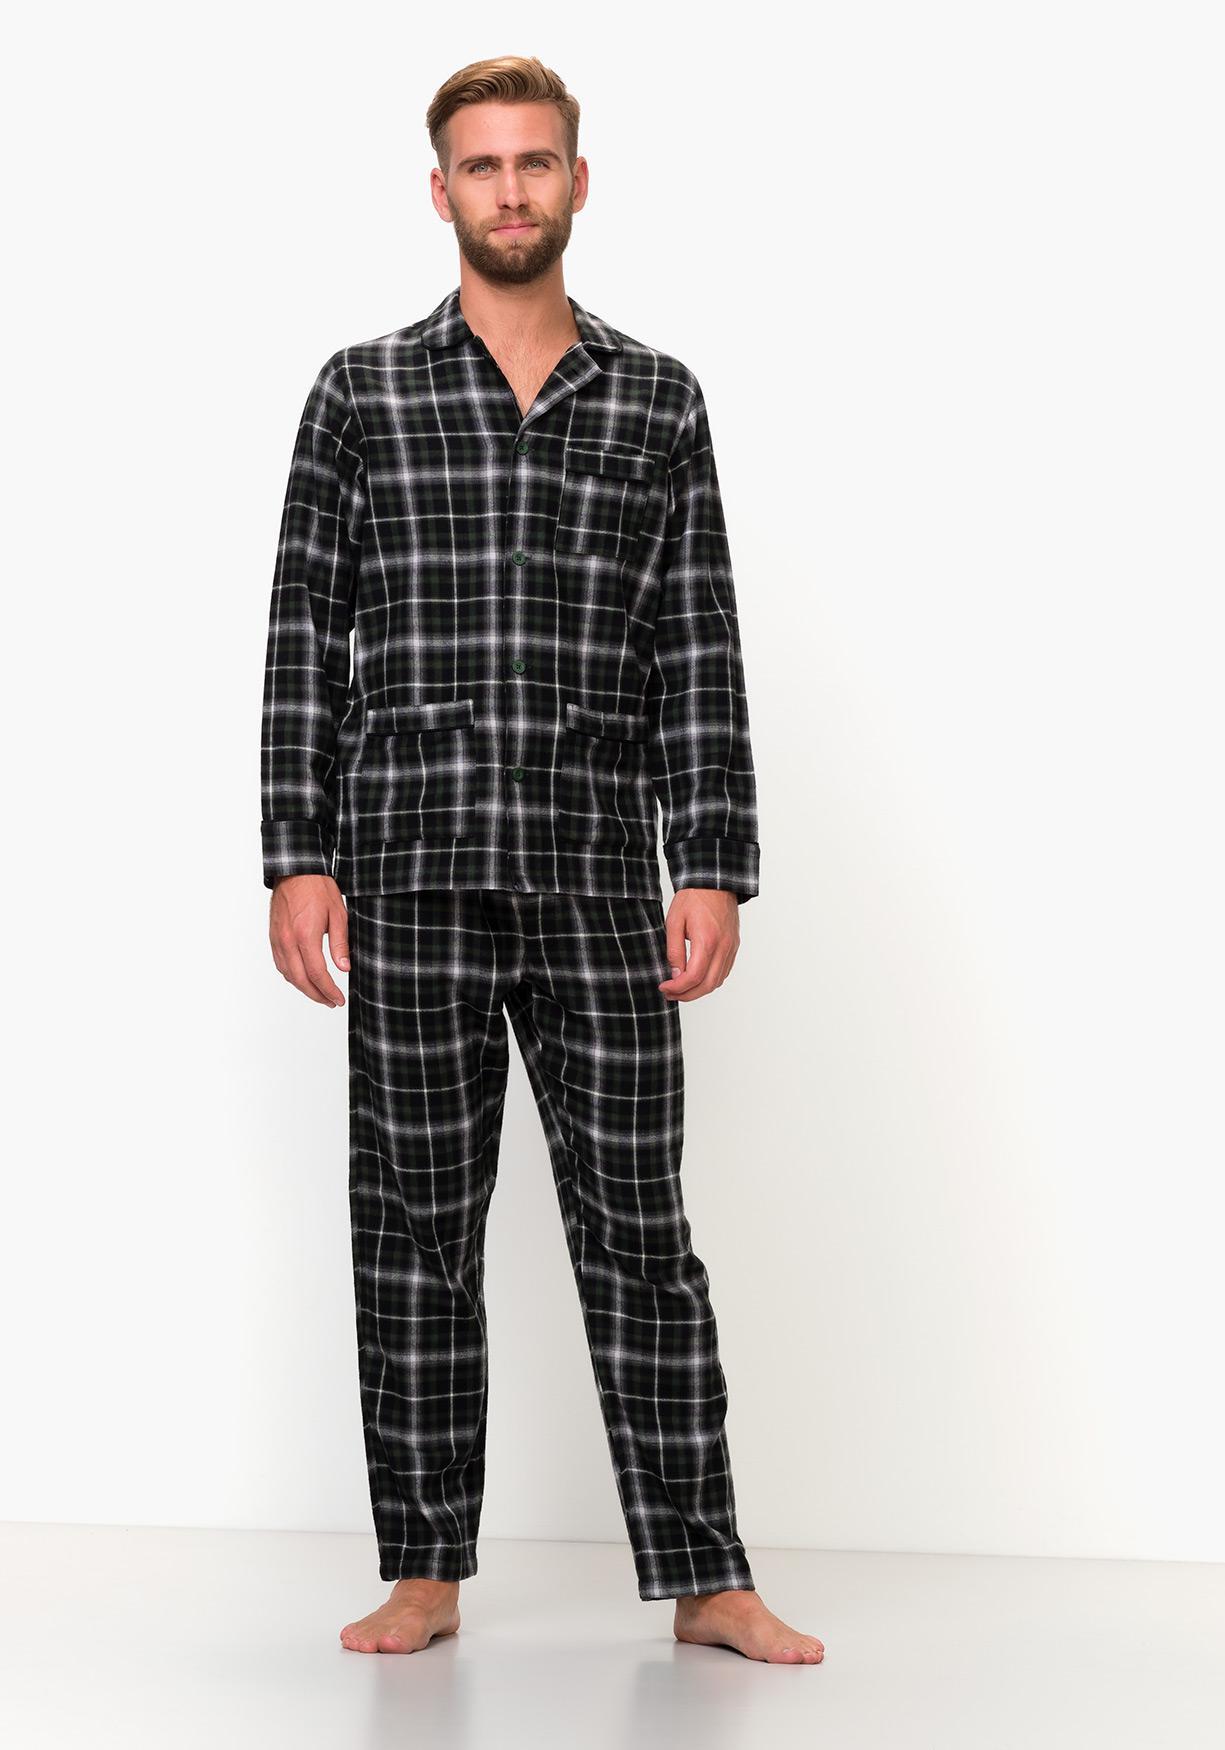 d8bd0b3289 Comprar Pijama franela de manga larga de cuadros TEX. ¡Aprovéchate ...